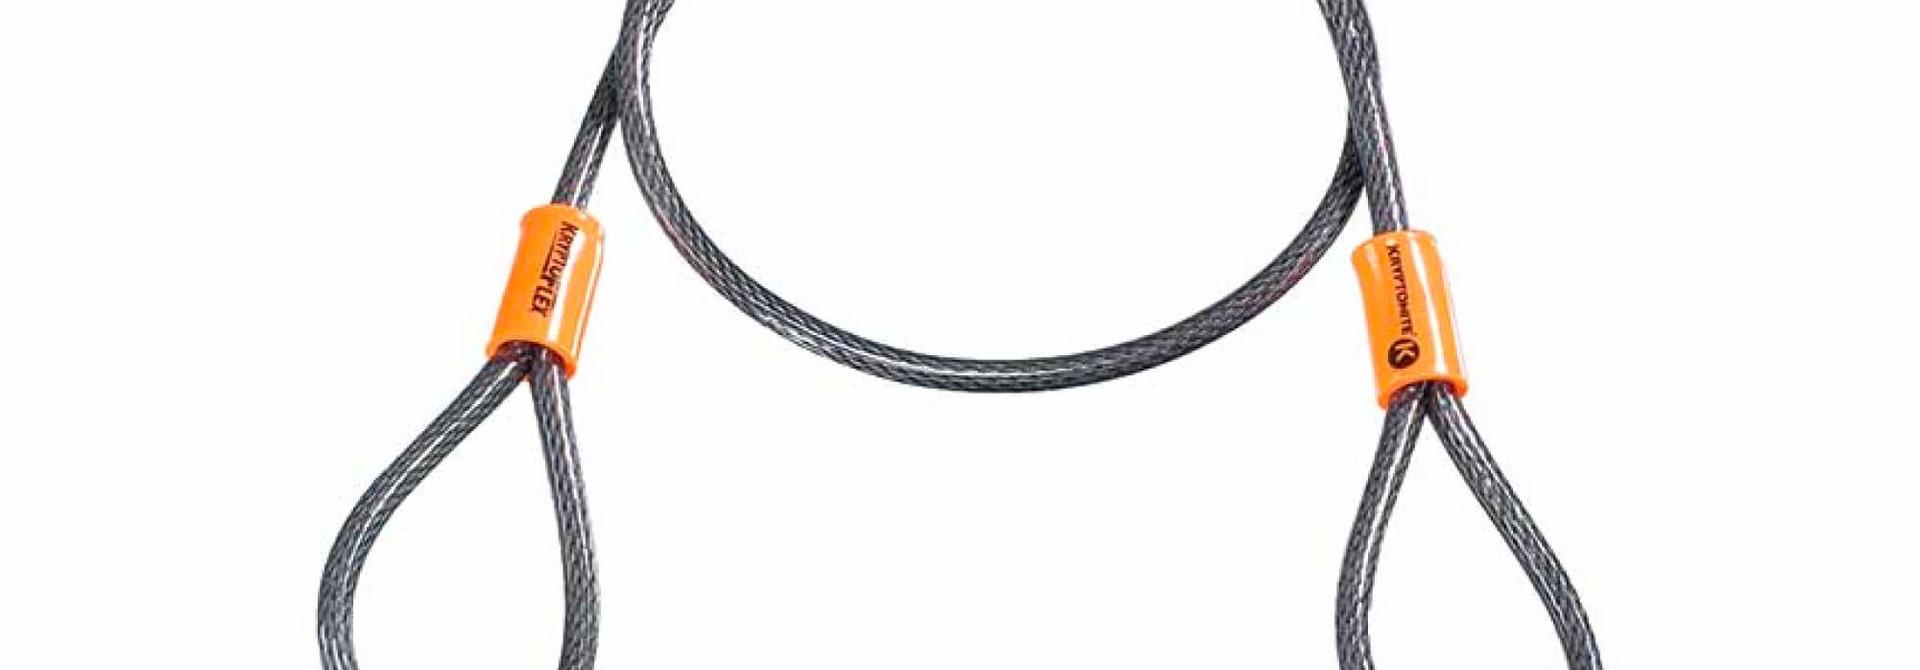 Kryptoflex 525 Looped Cable 76cm X 5mm